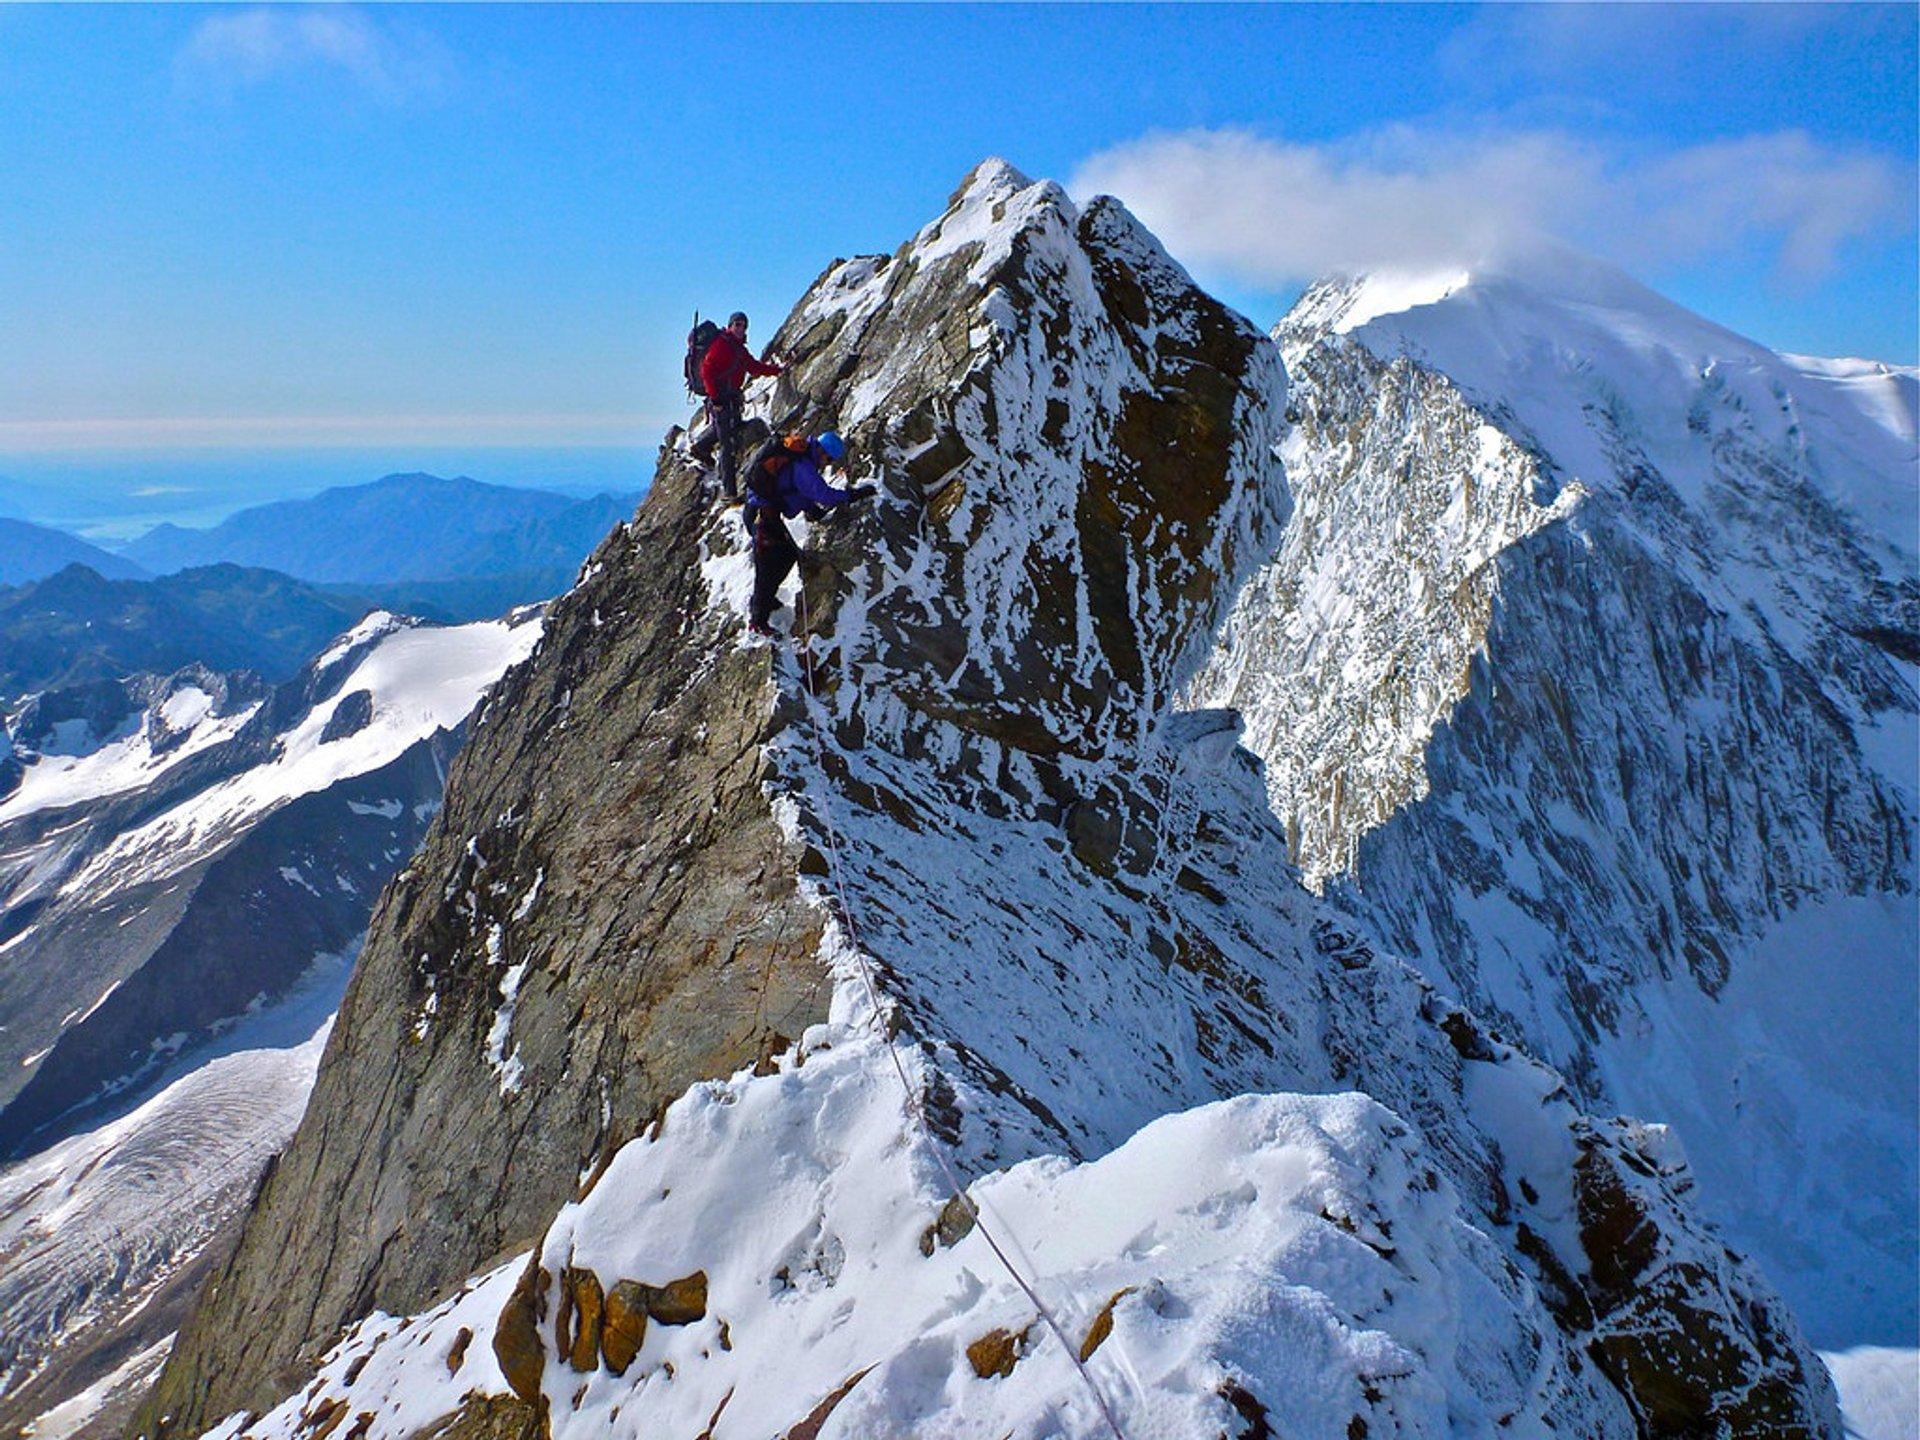 Mountain Climbing in Bolivia - Best Season